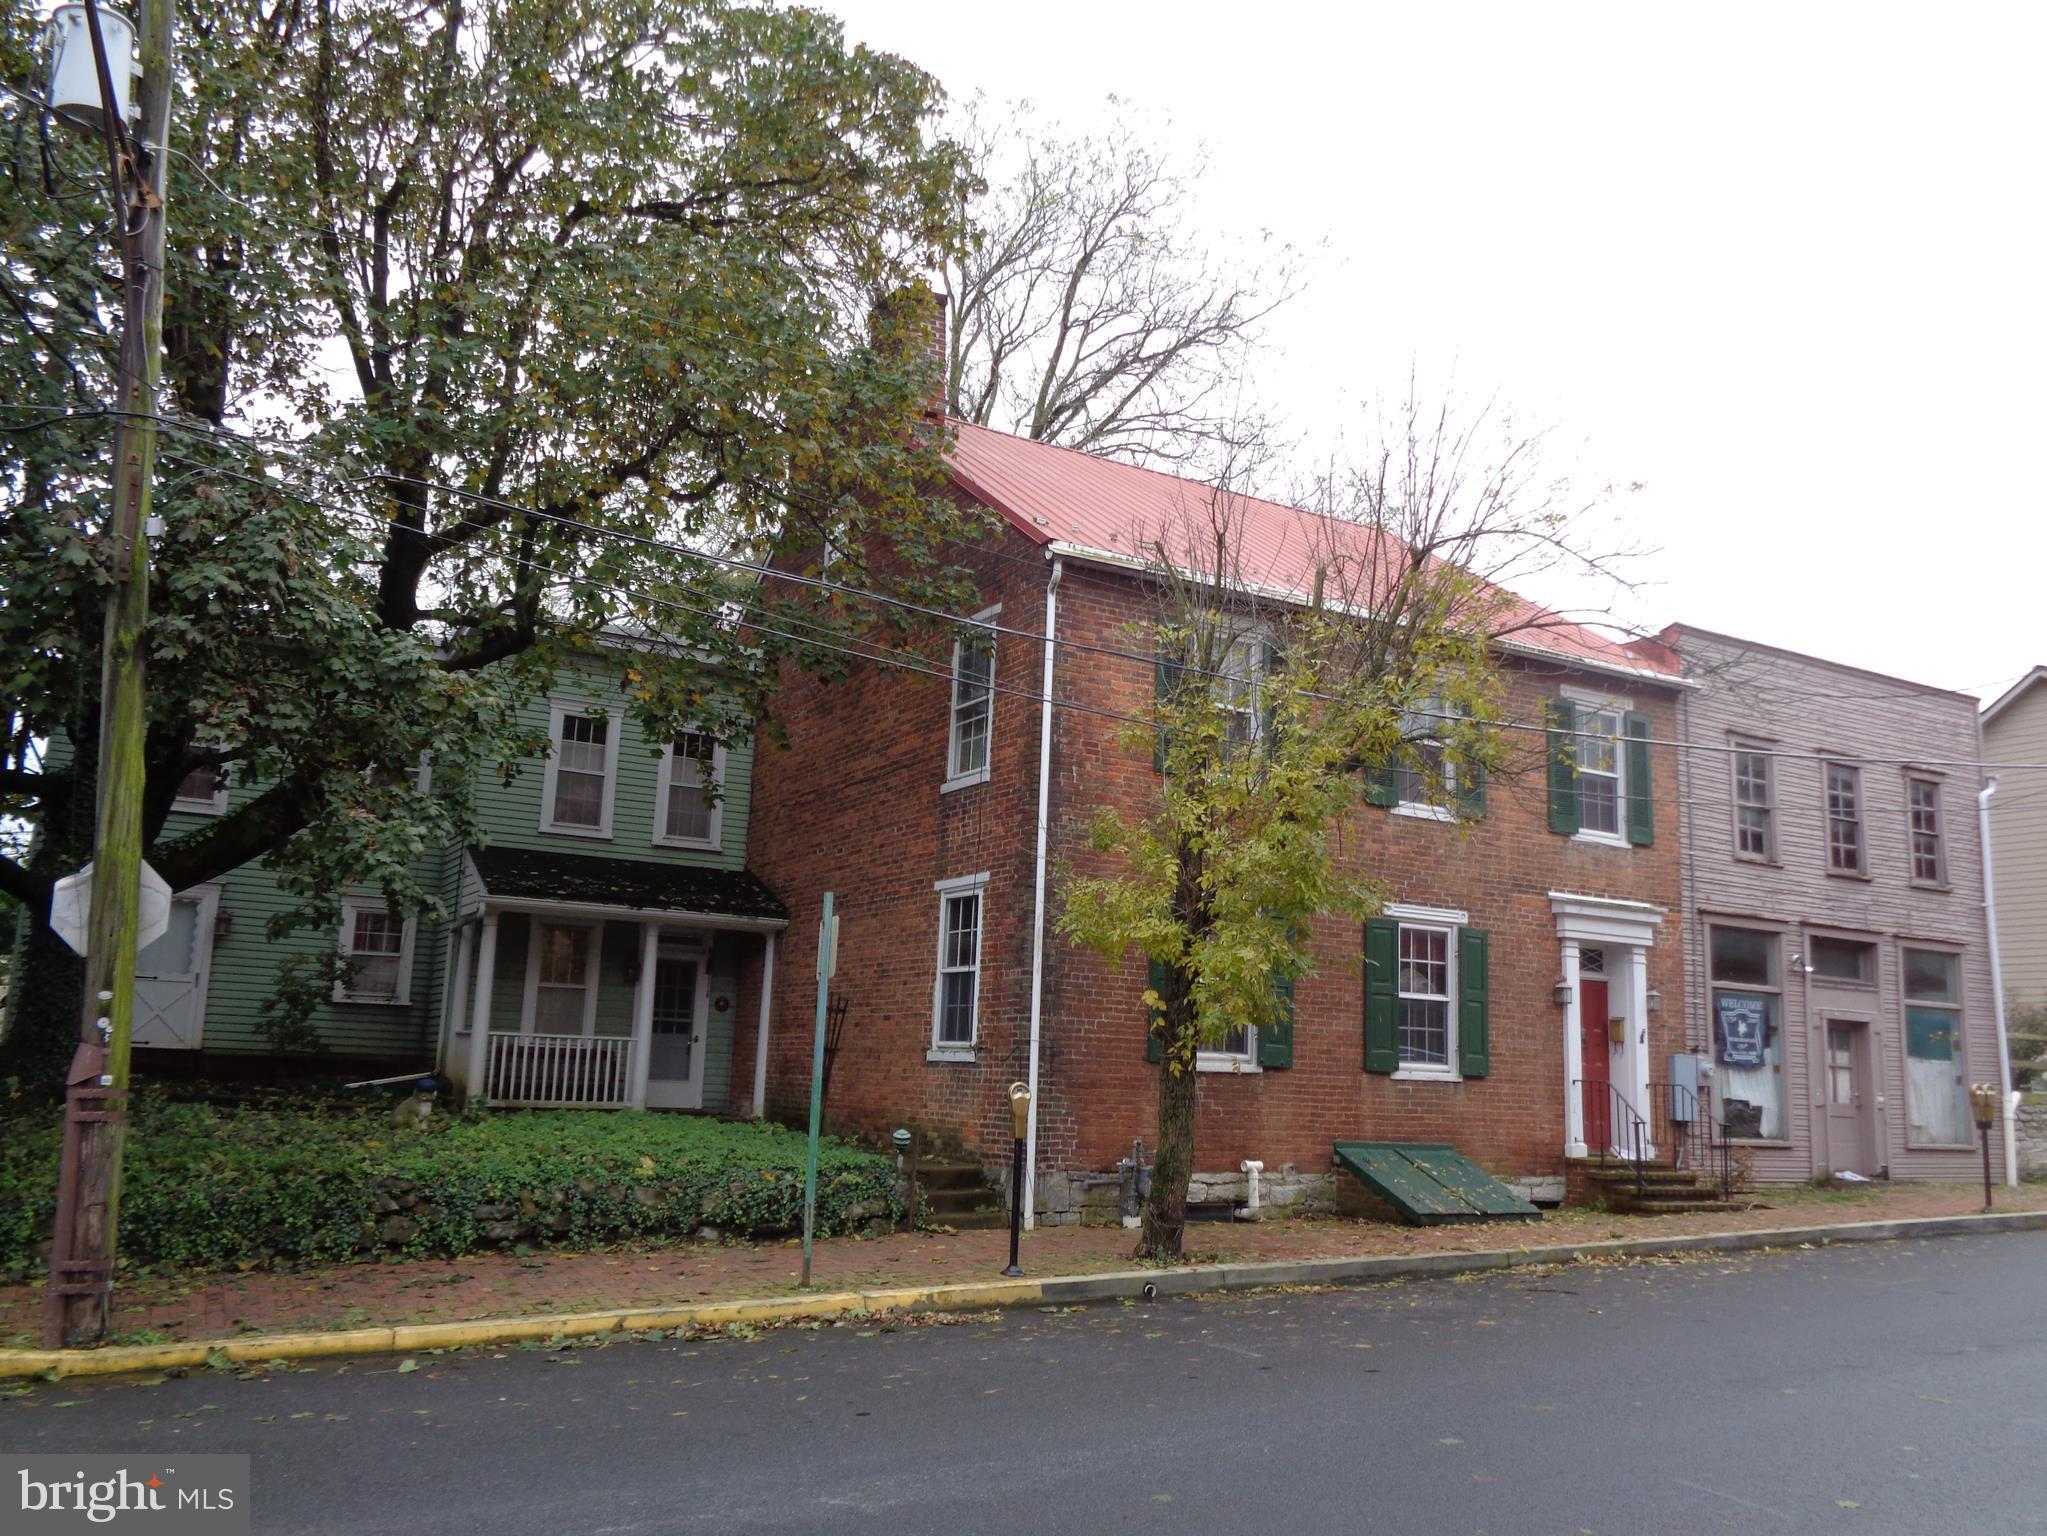 14 E SEMINARY STREET, MERCERSBURG, PA 17236